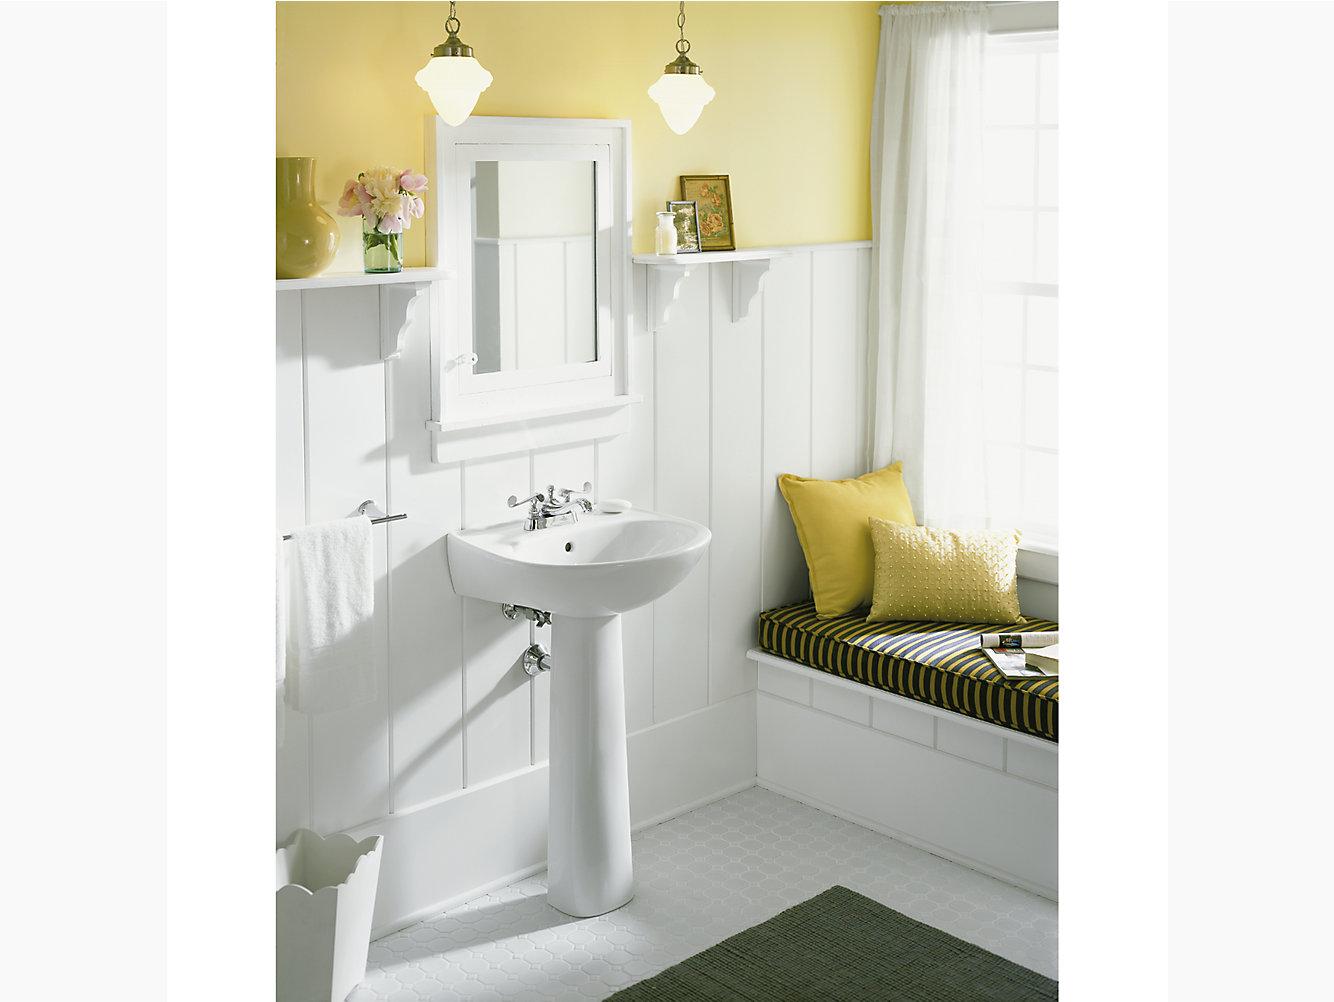 Sacramento Pedestal Bathroom Sink 442124 Sterling